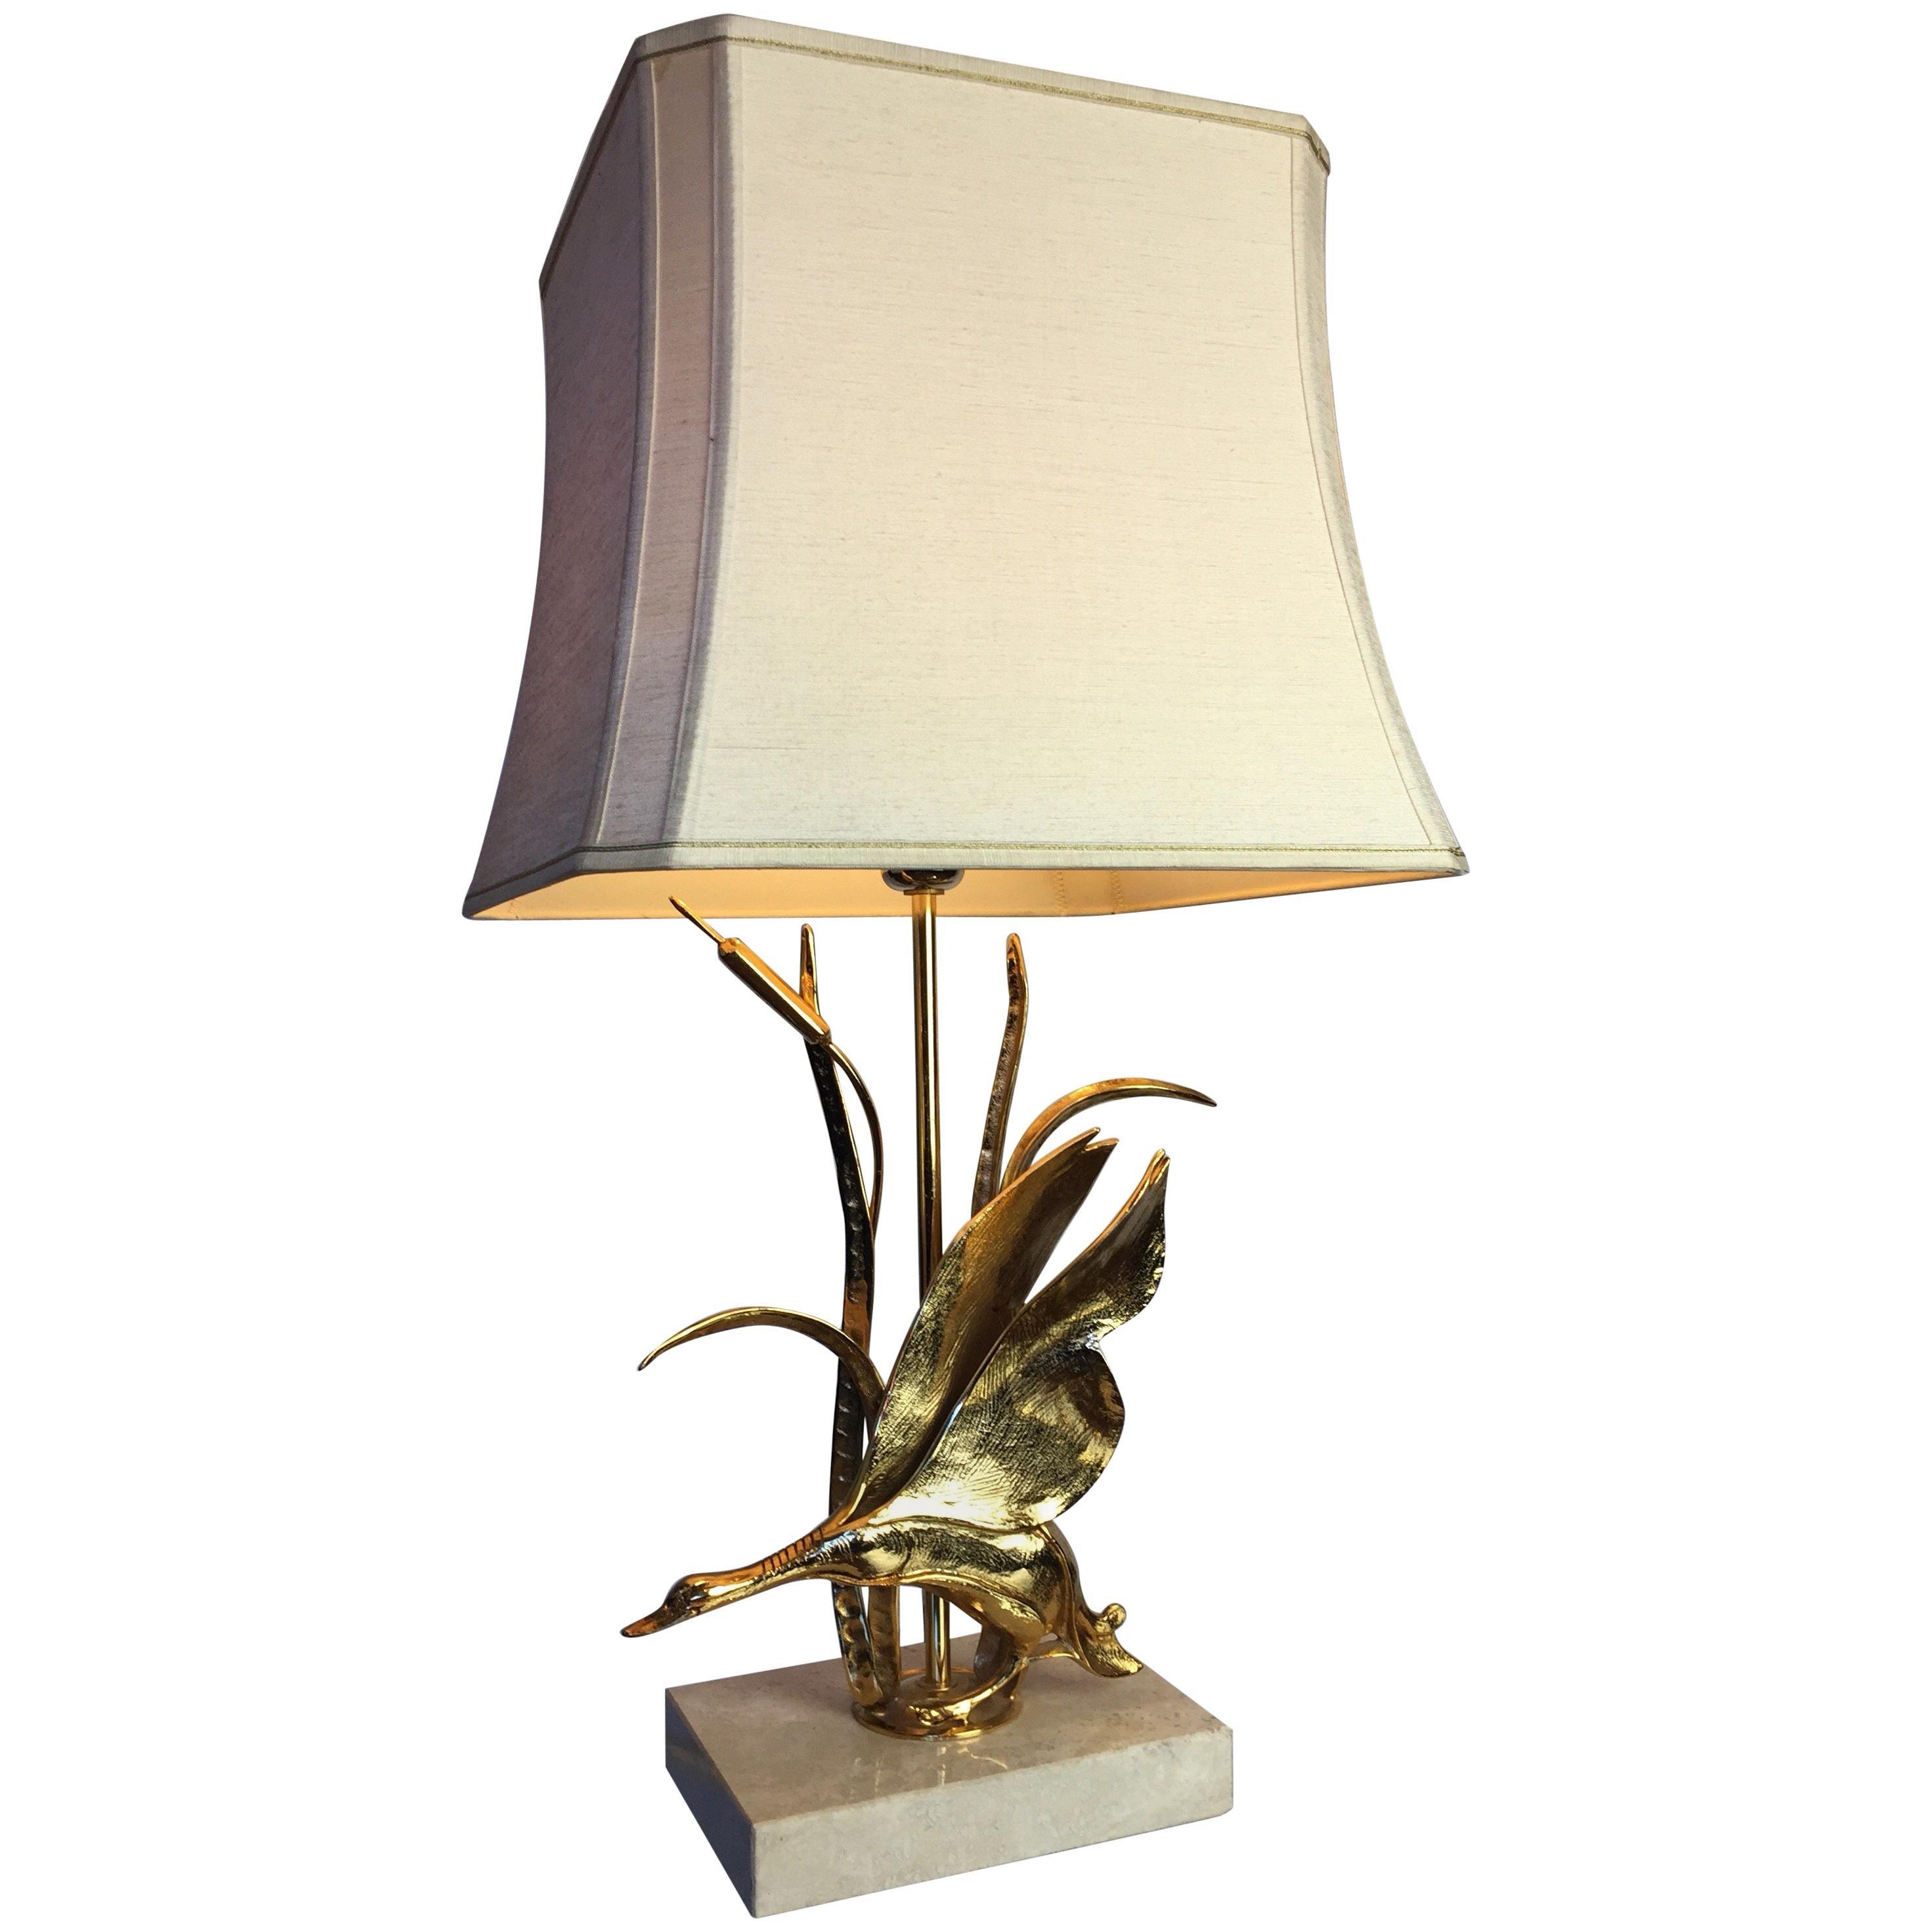 Brass Bird Table Lamp by Lanciotto Galeotti for L' Originale, Italy, 1970s